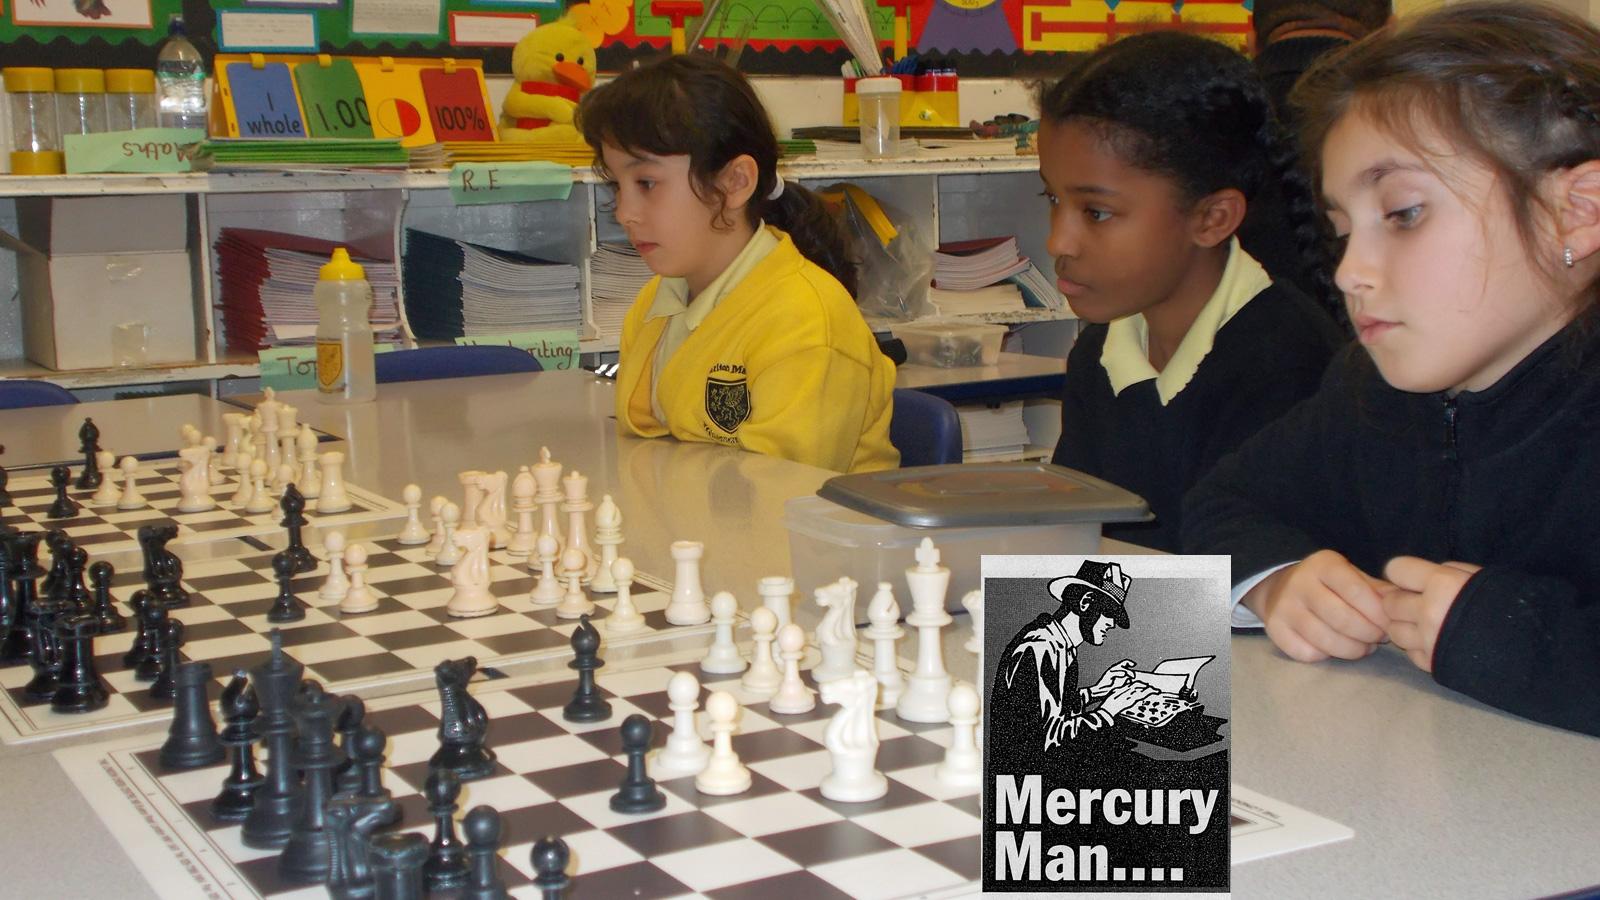 Meet the Charlton chess king sharing his skills in schools